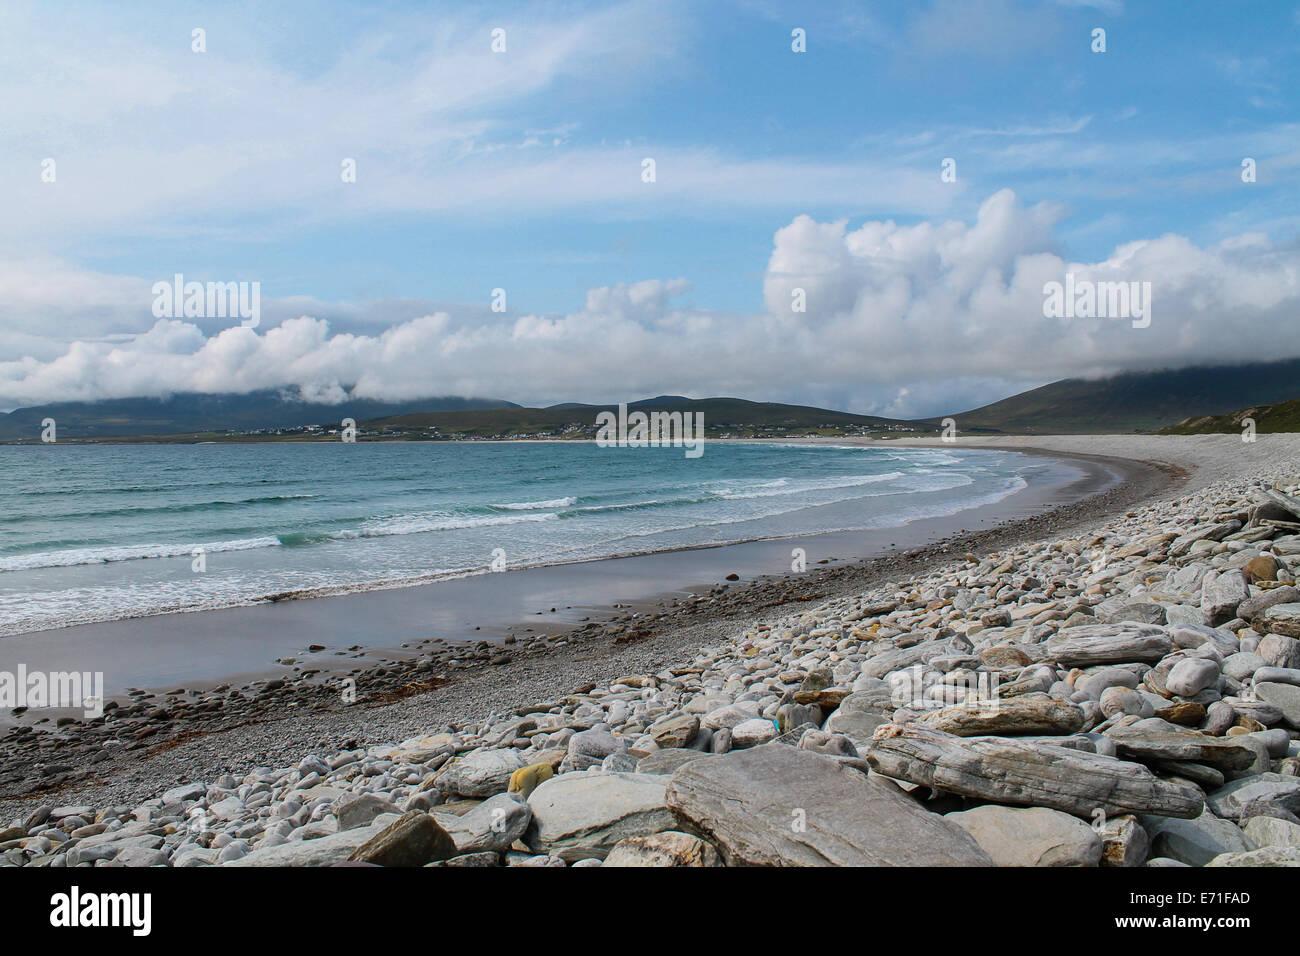 Keel beach, Achill Island, County Mayo, Ireland - Stock Image